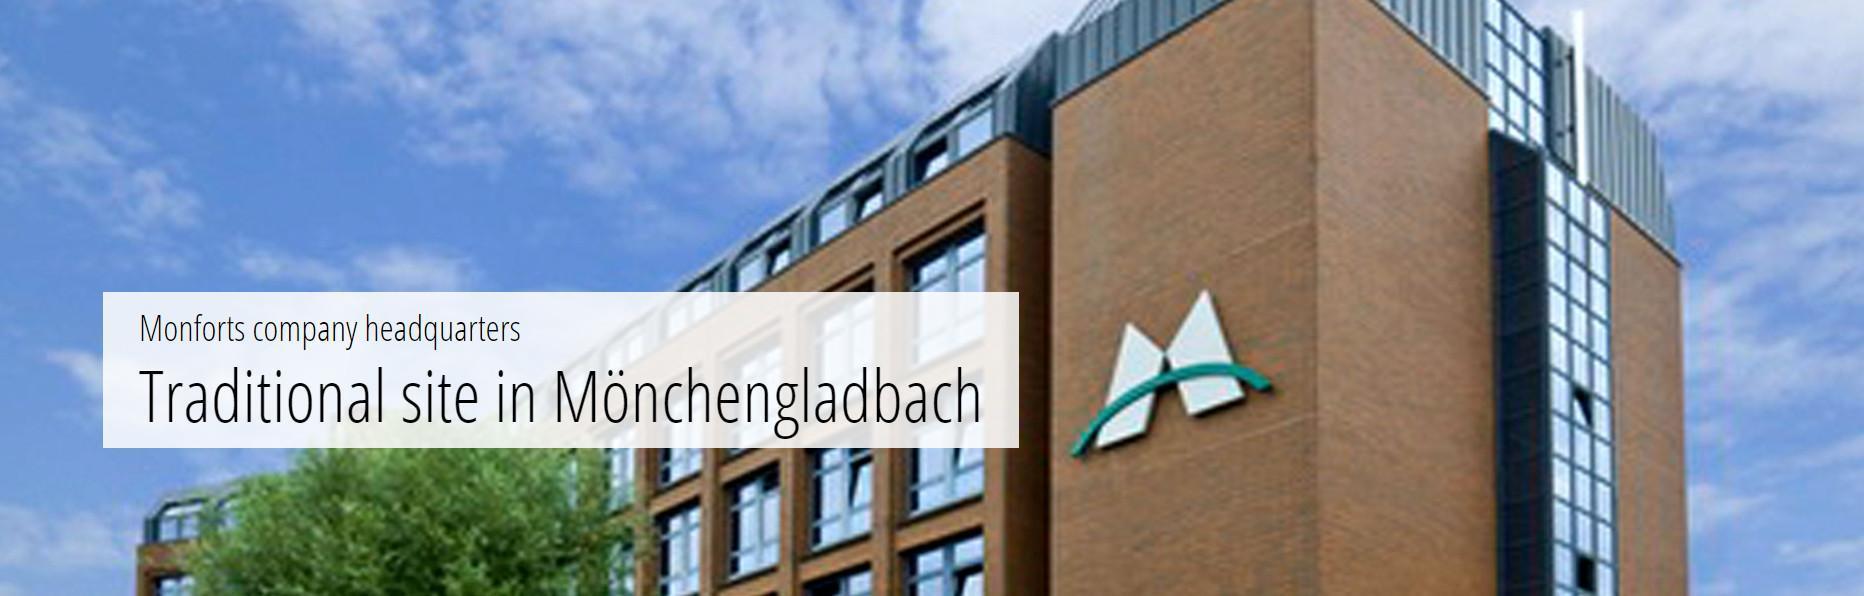 The Monforts Advanced Technology Center (ATC) in Mönchengladbach